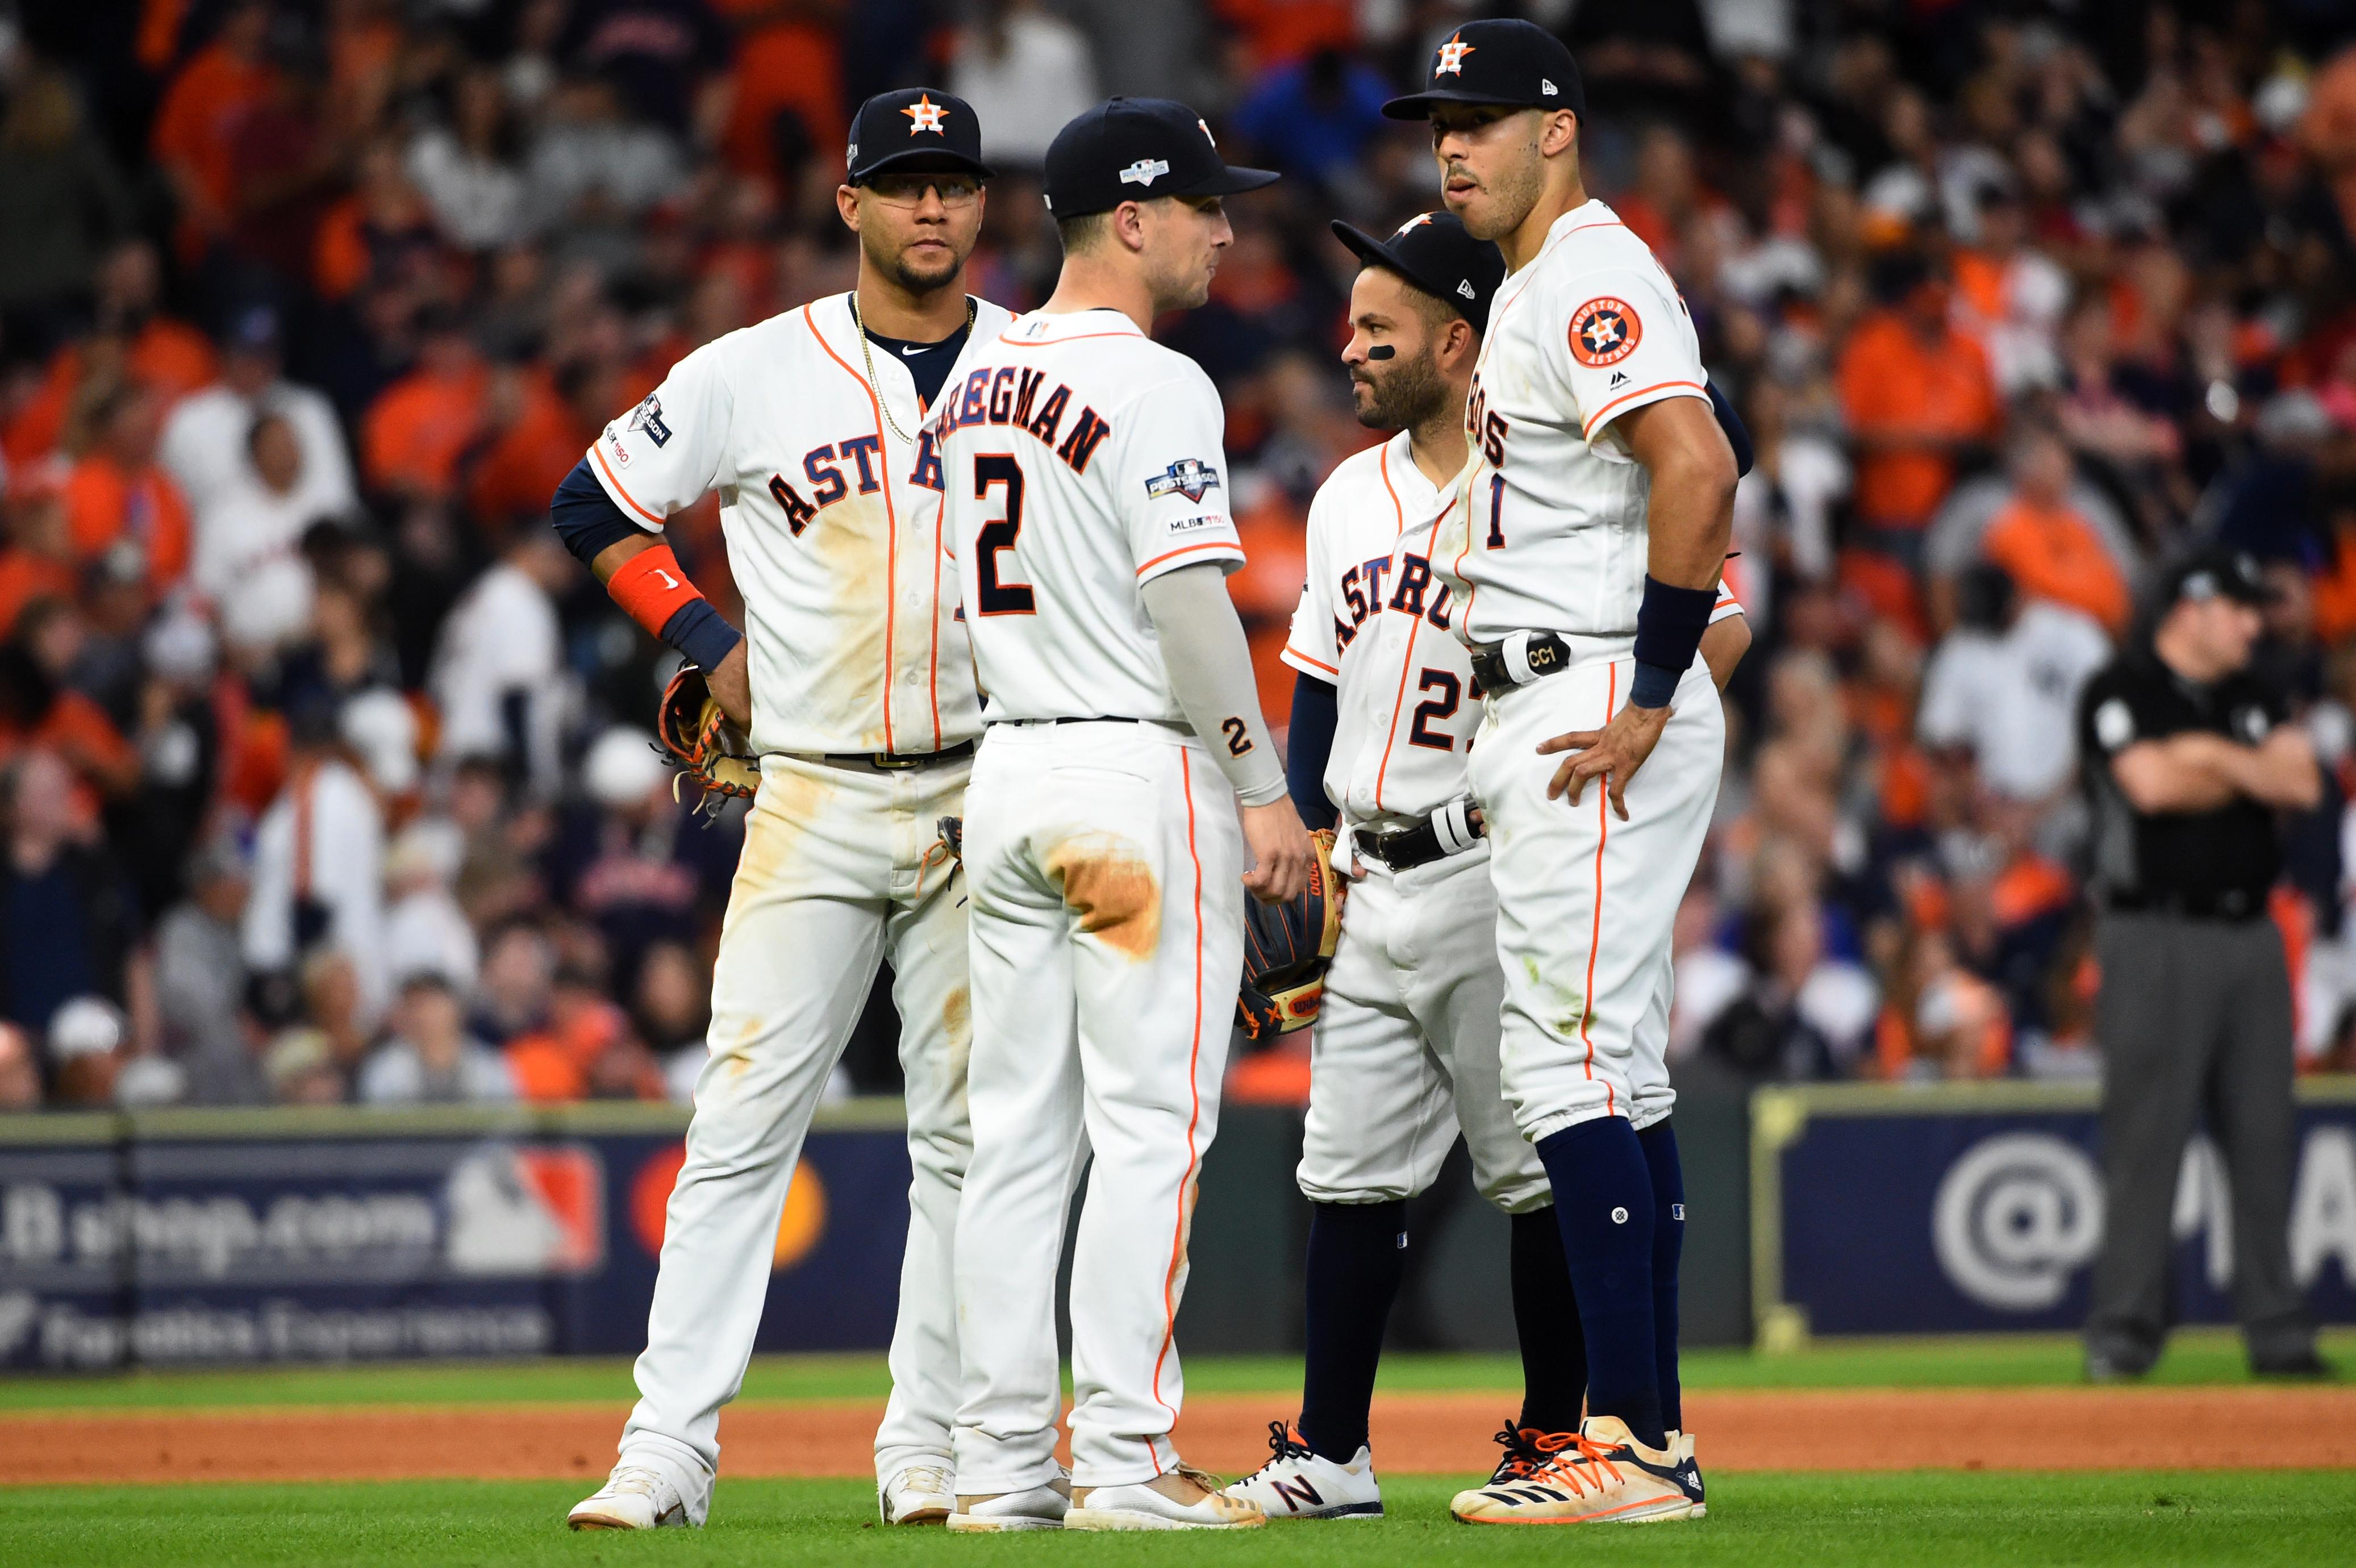 2019 ALCS Game 1 - New York Yankees v. Houston Astros